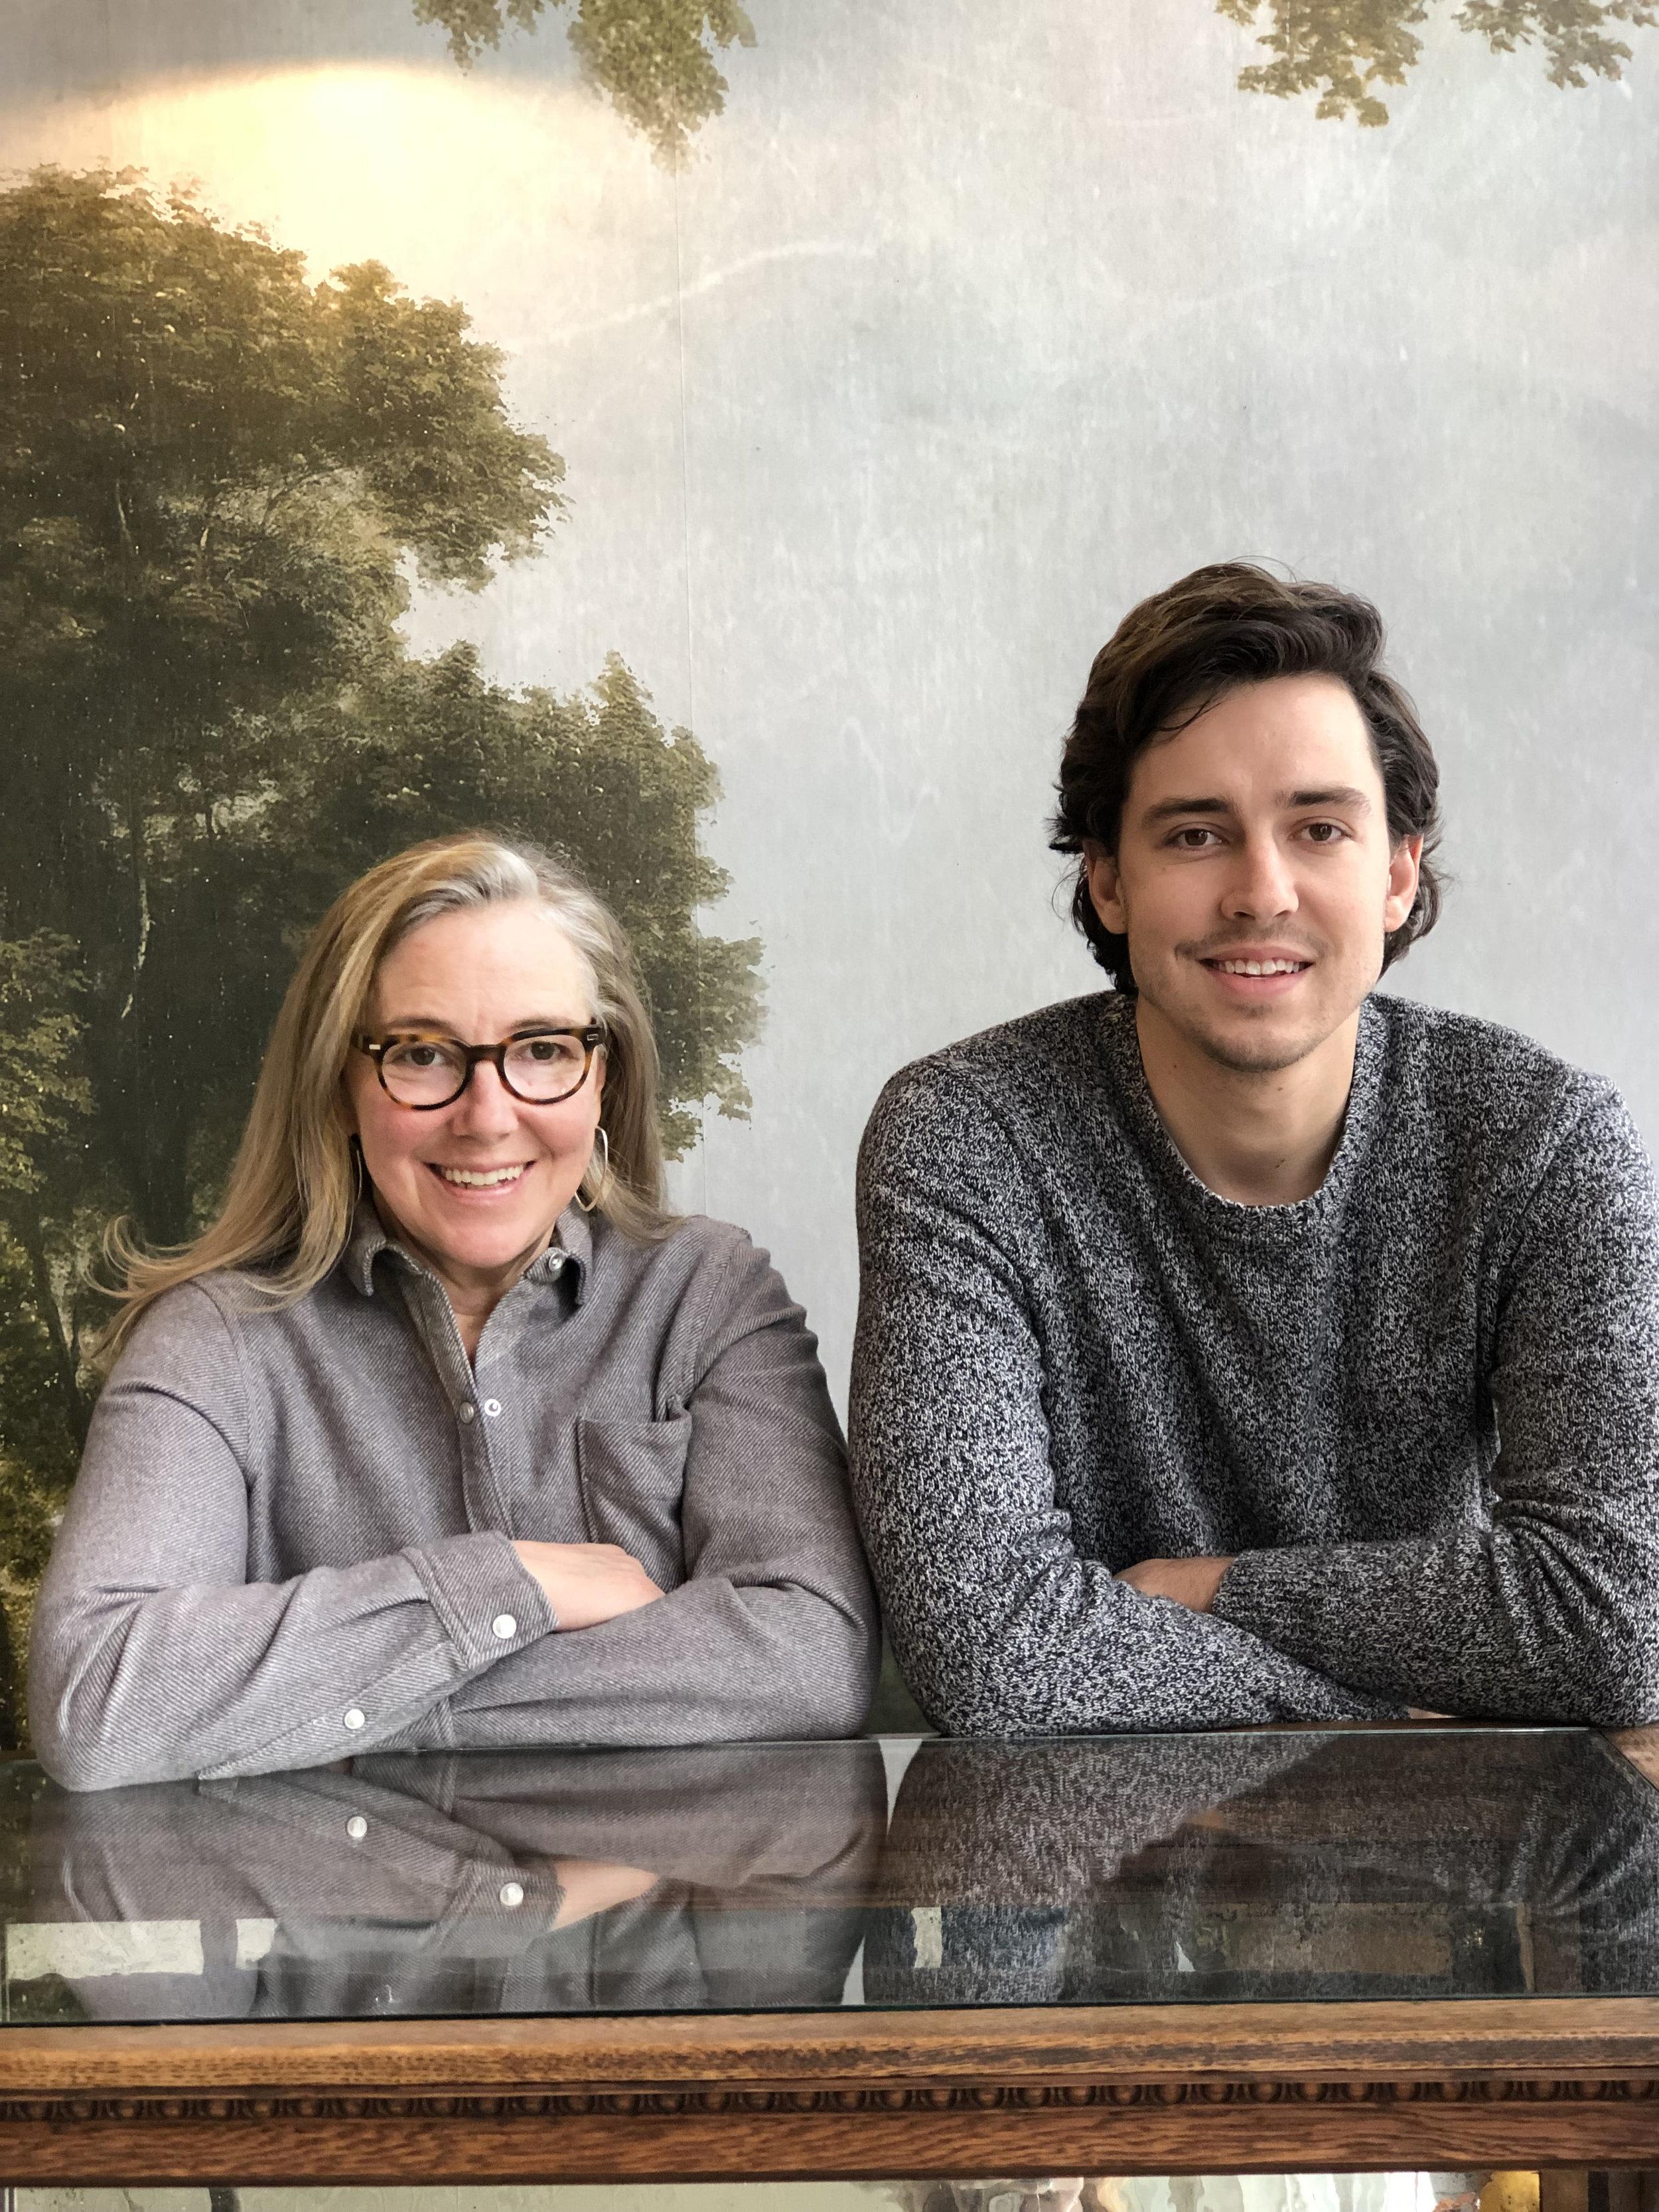 Kelley Hall-Barr and Ian VanDam